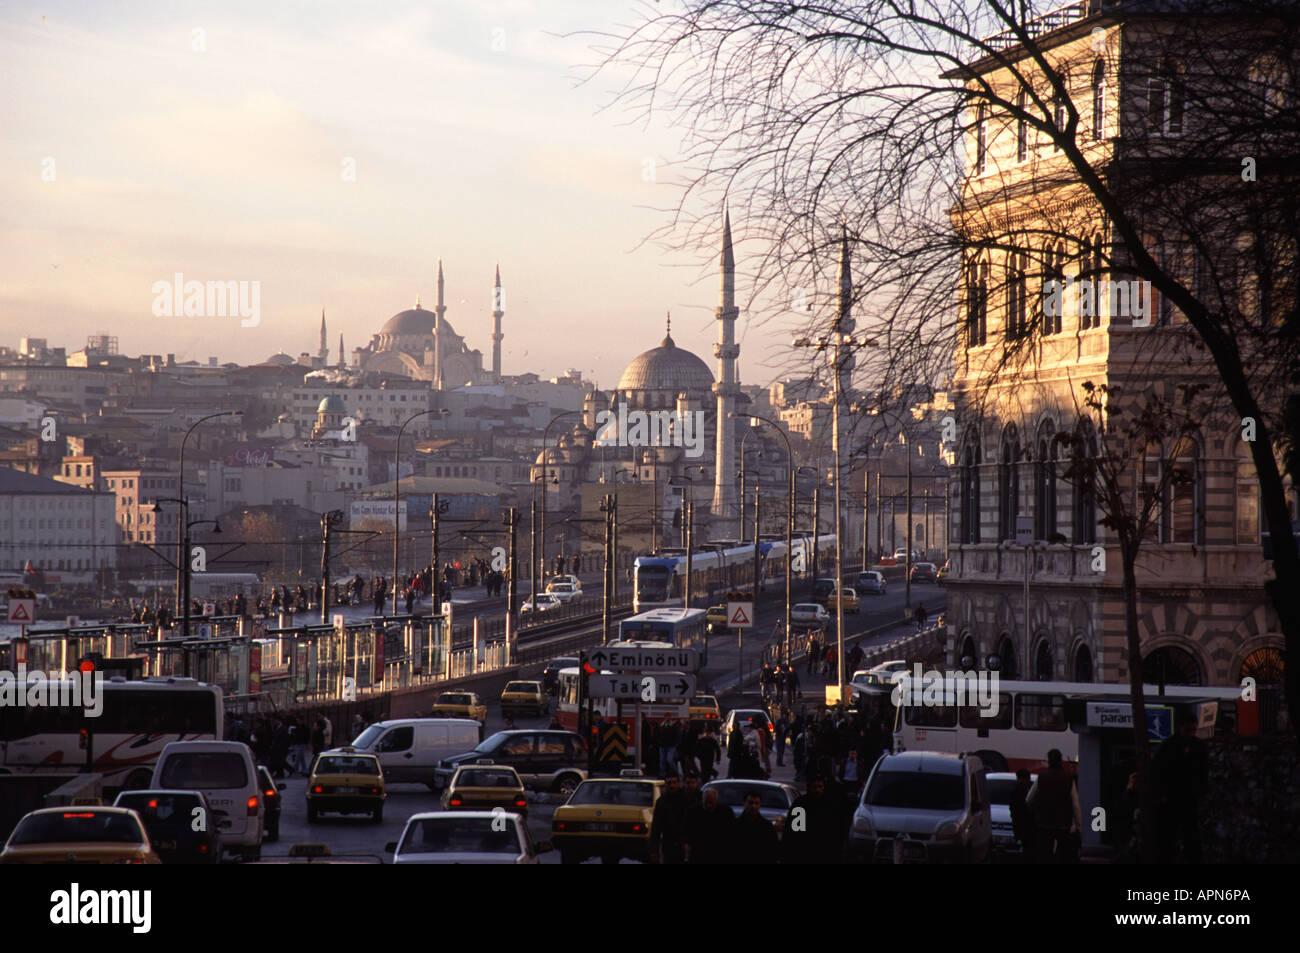 ISTANBUL, TURKEY. Rush hour in Karakoy looking across the Galata Bridge towards Eminonu. 2006. Stock Photo